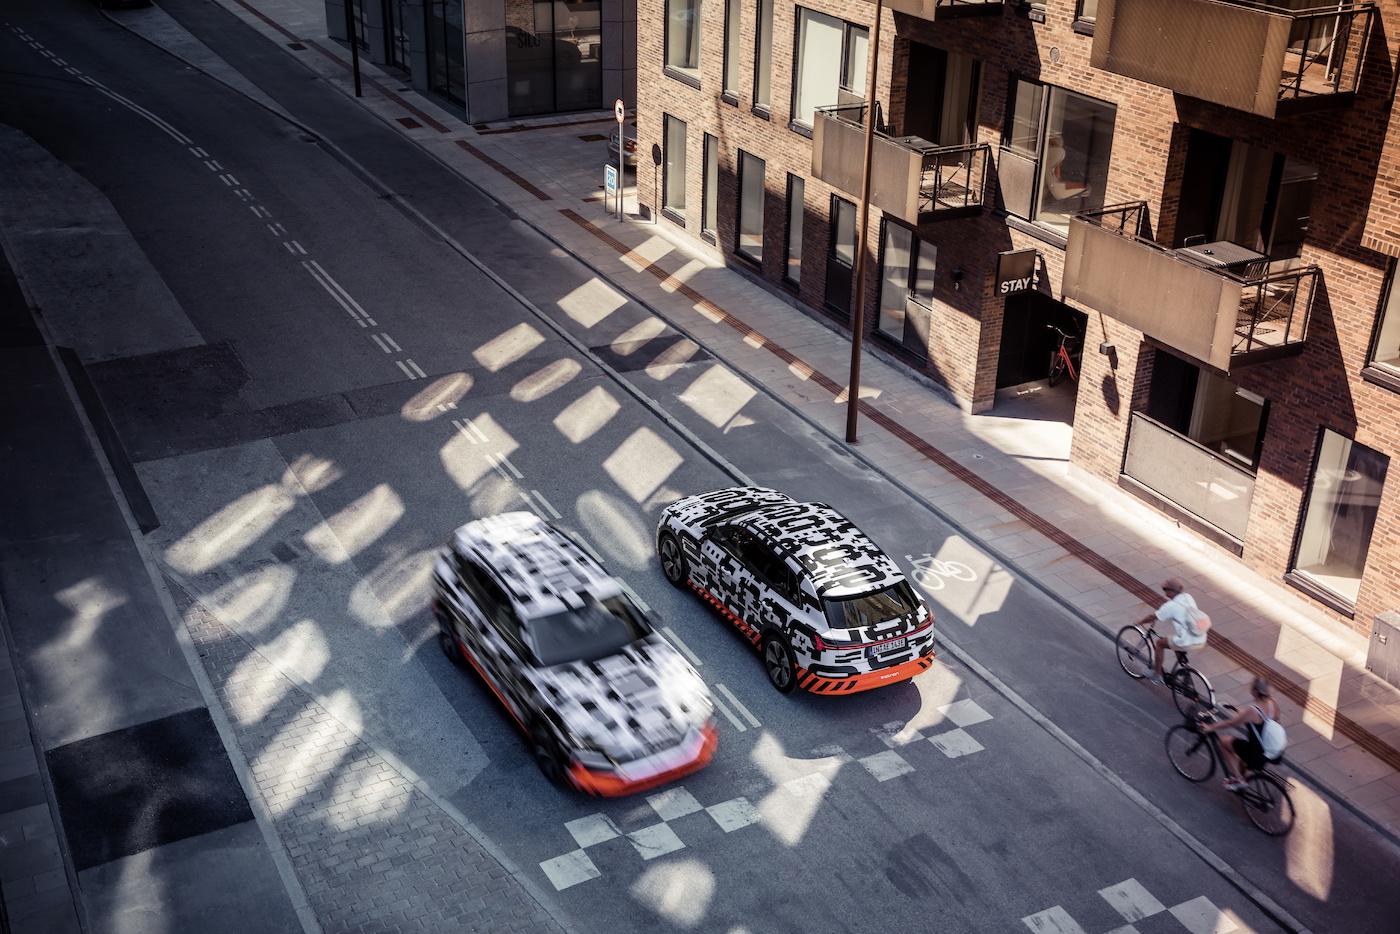 Zwei e-tron-Prototypen auf der Strasse in Kopenhagen. (Audi)